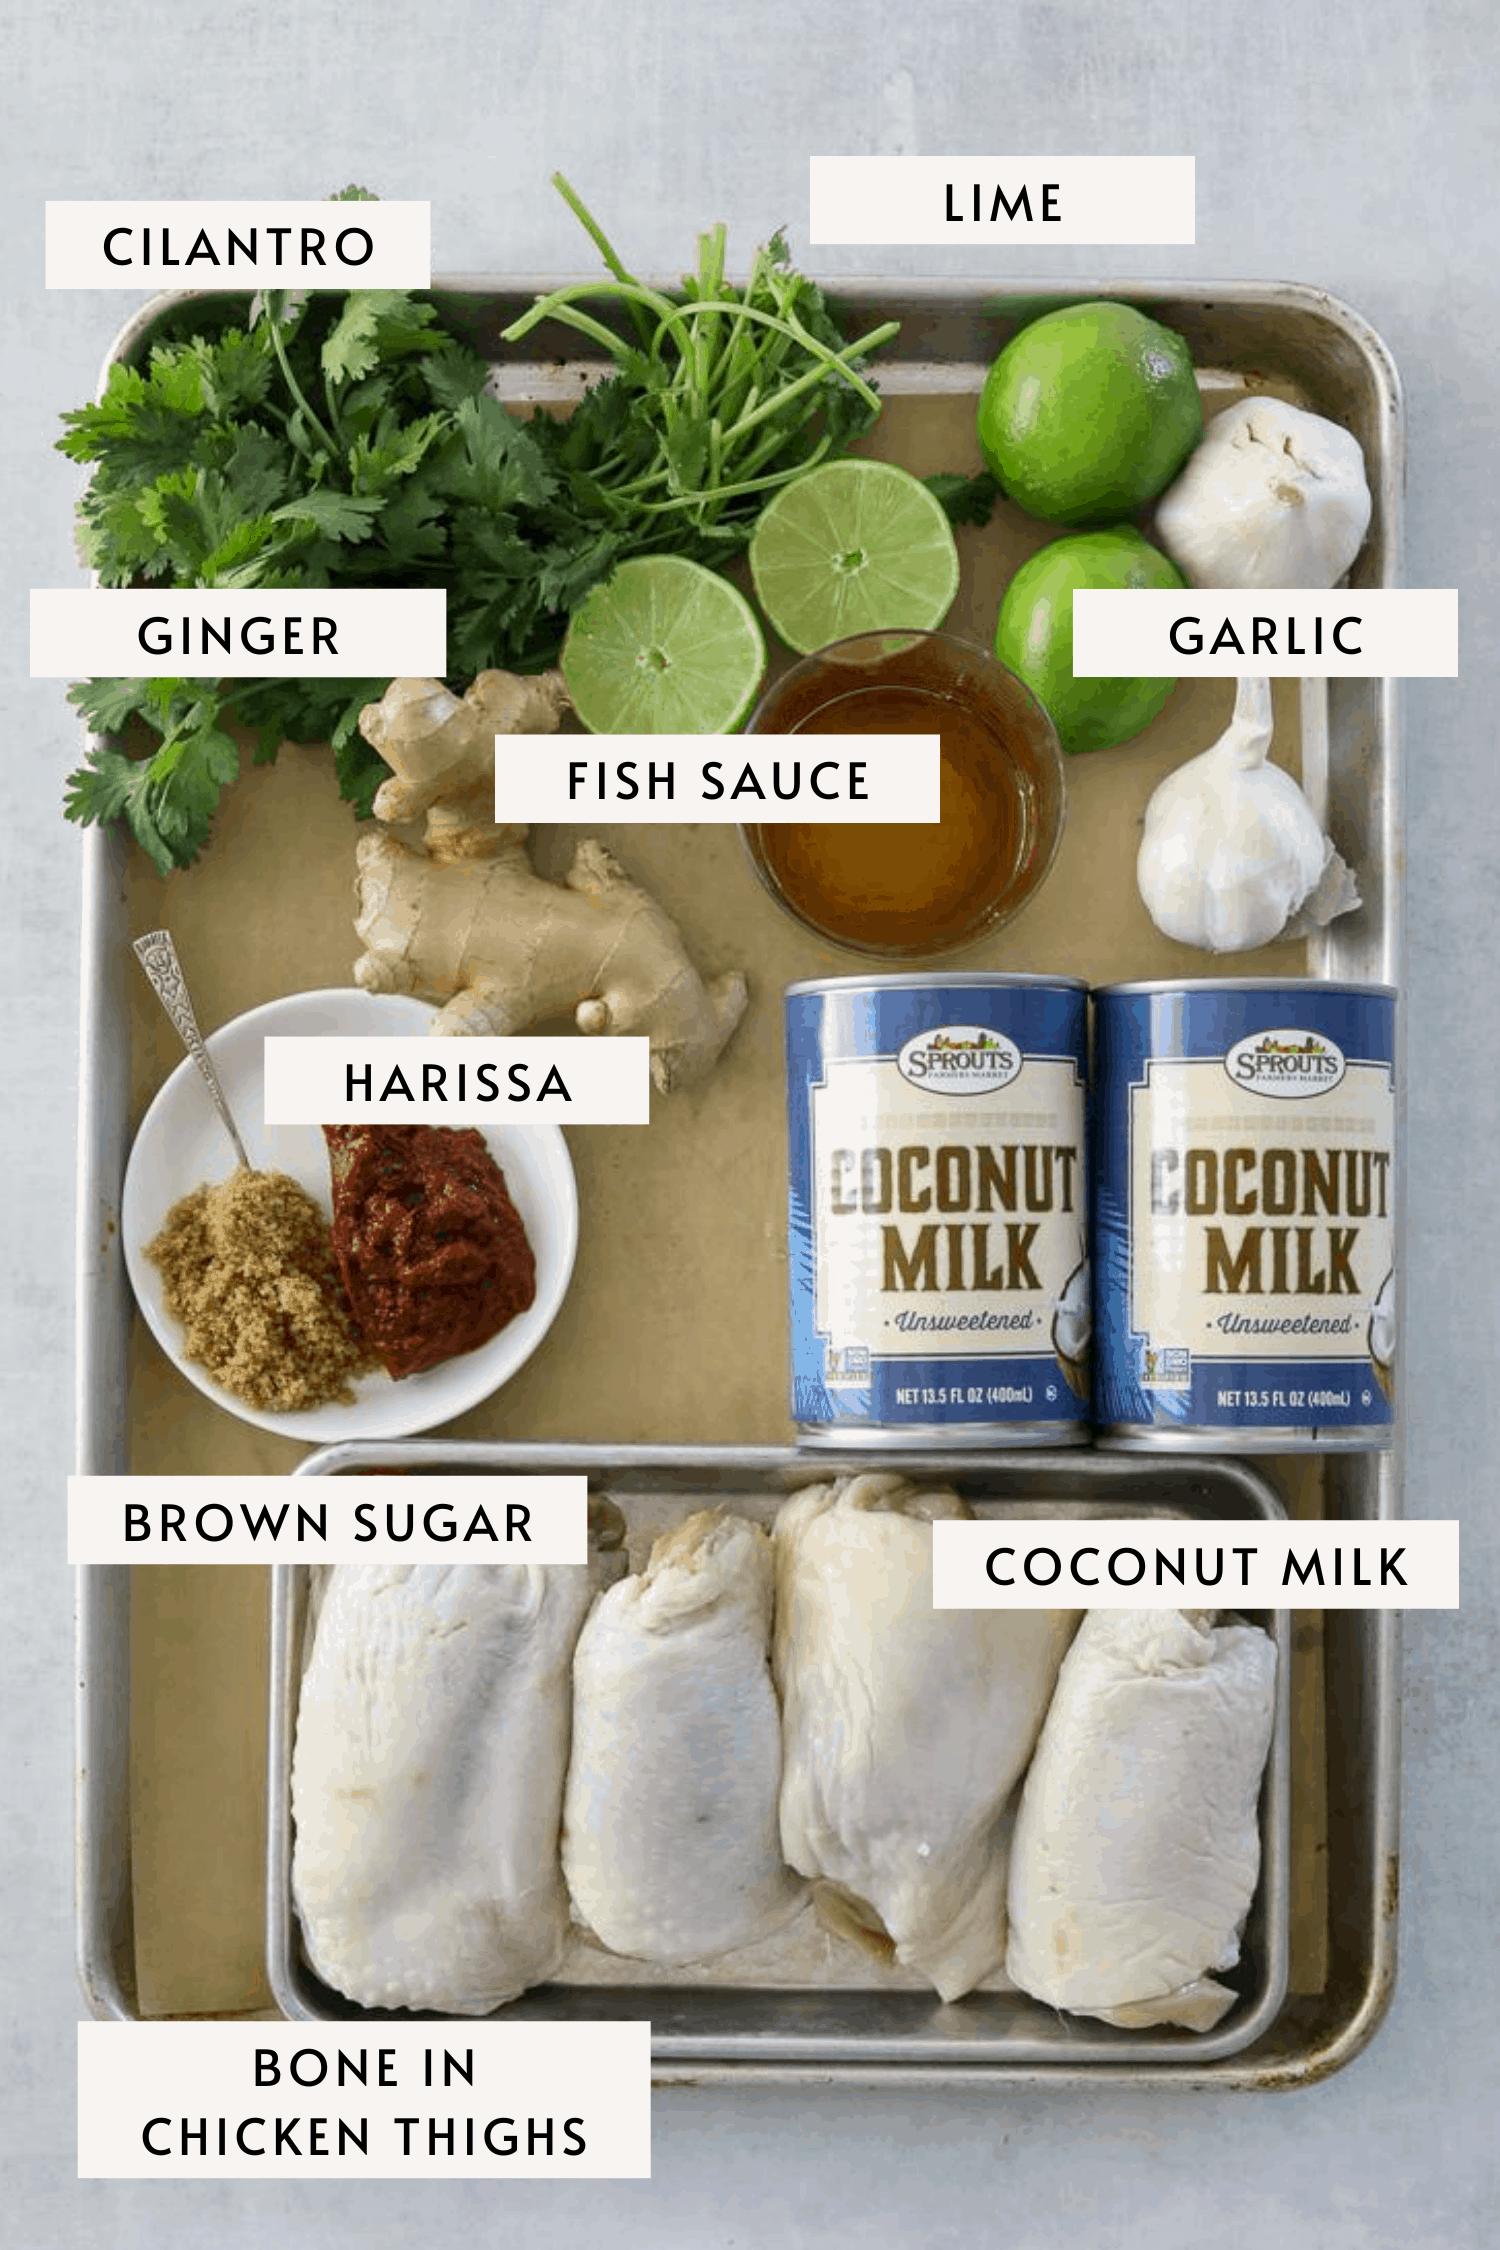 recipe ingredients on a baking tray; chicken thighs, harissa paste, garlic, ginger etc